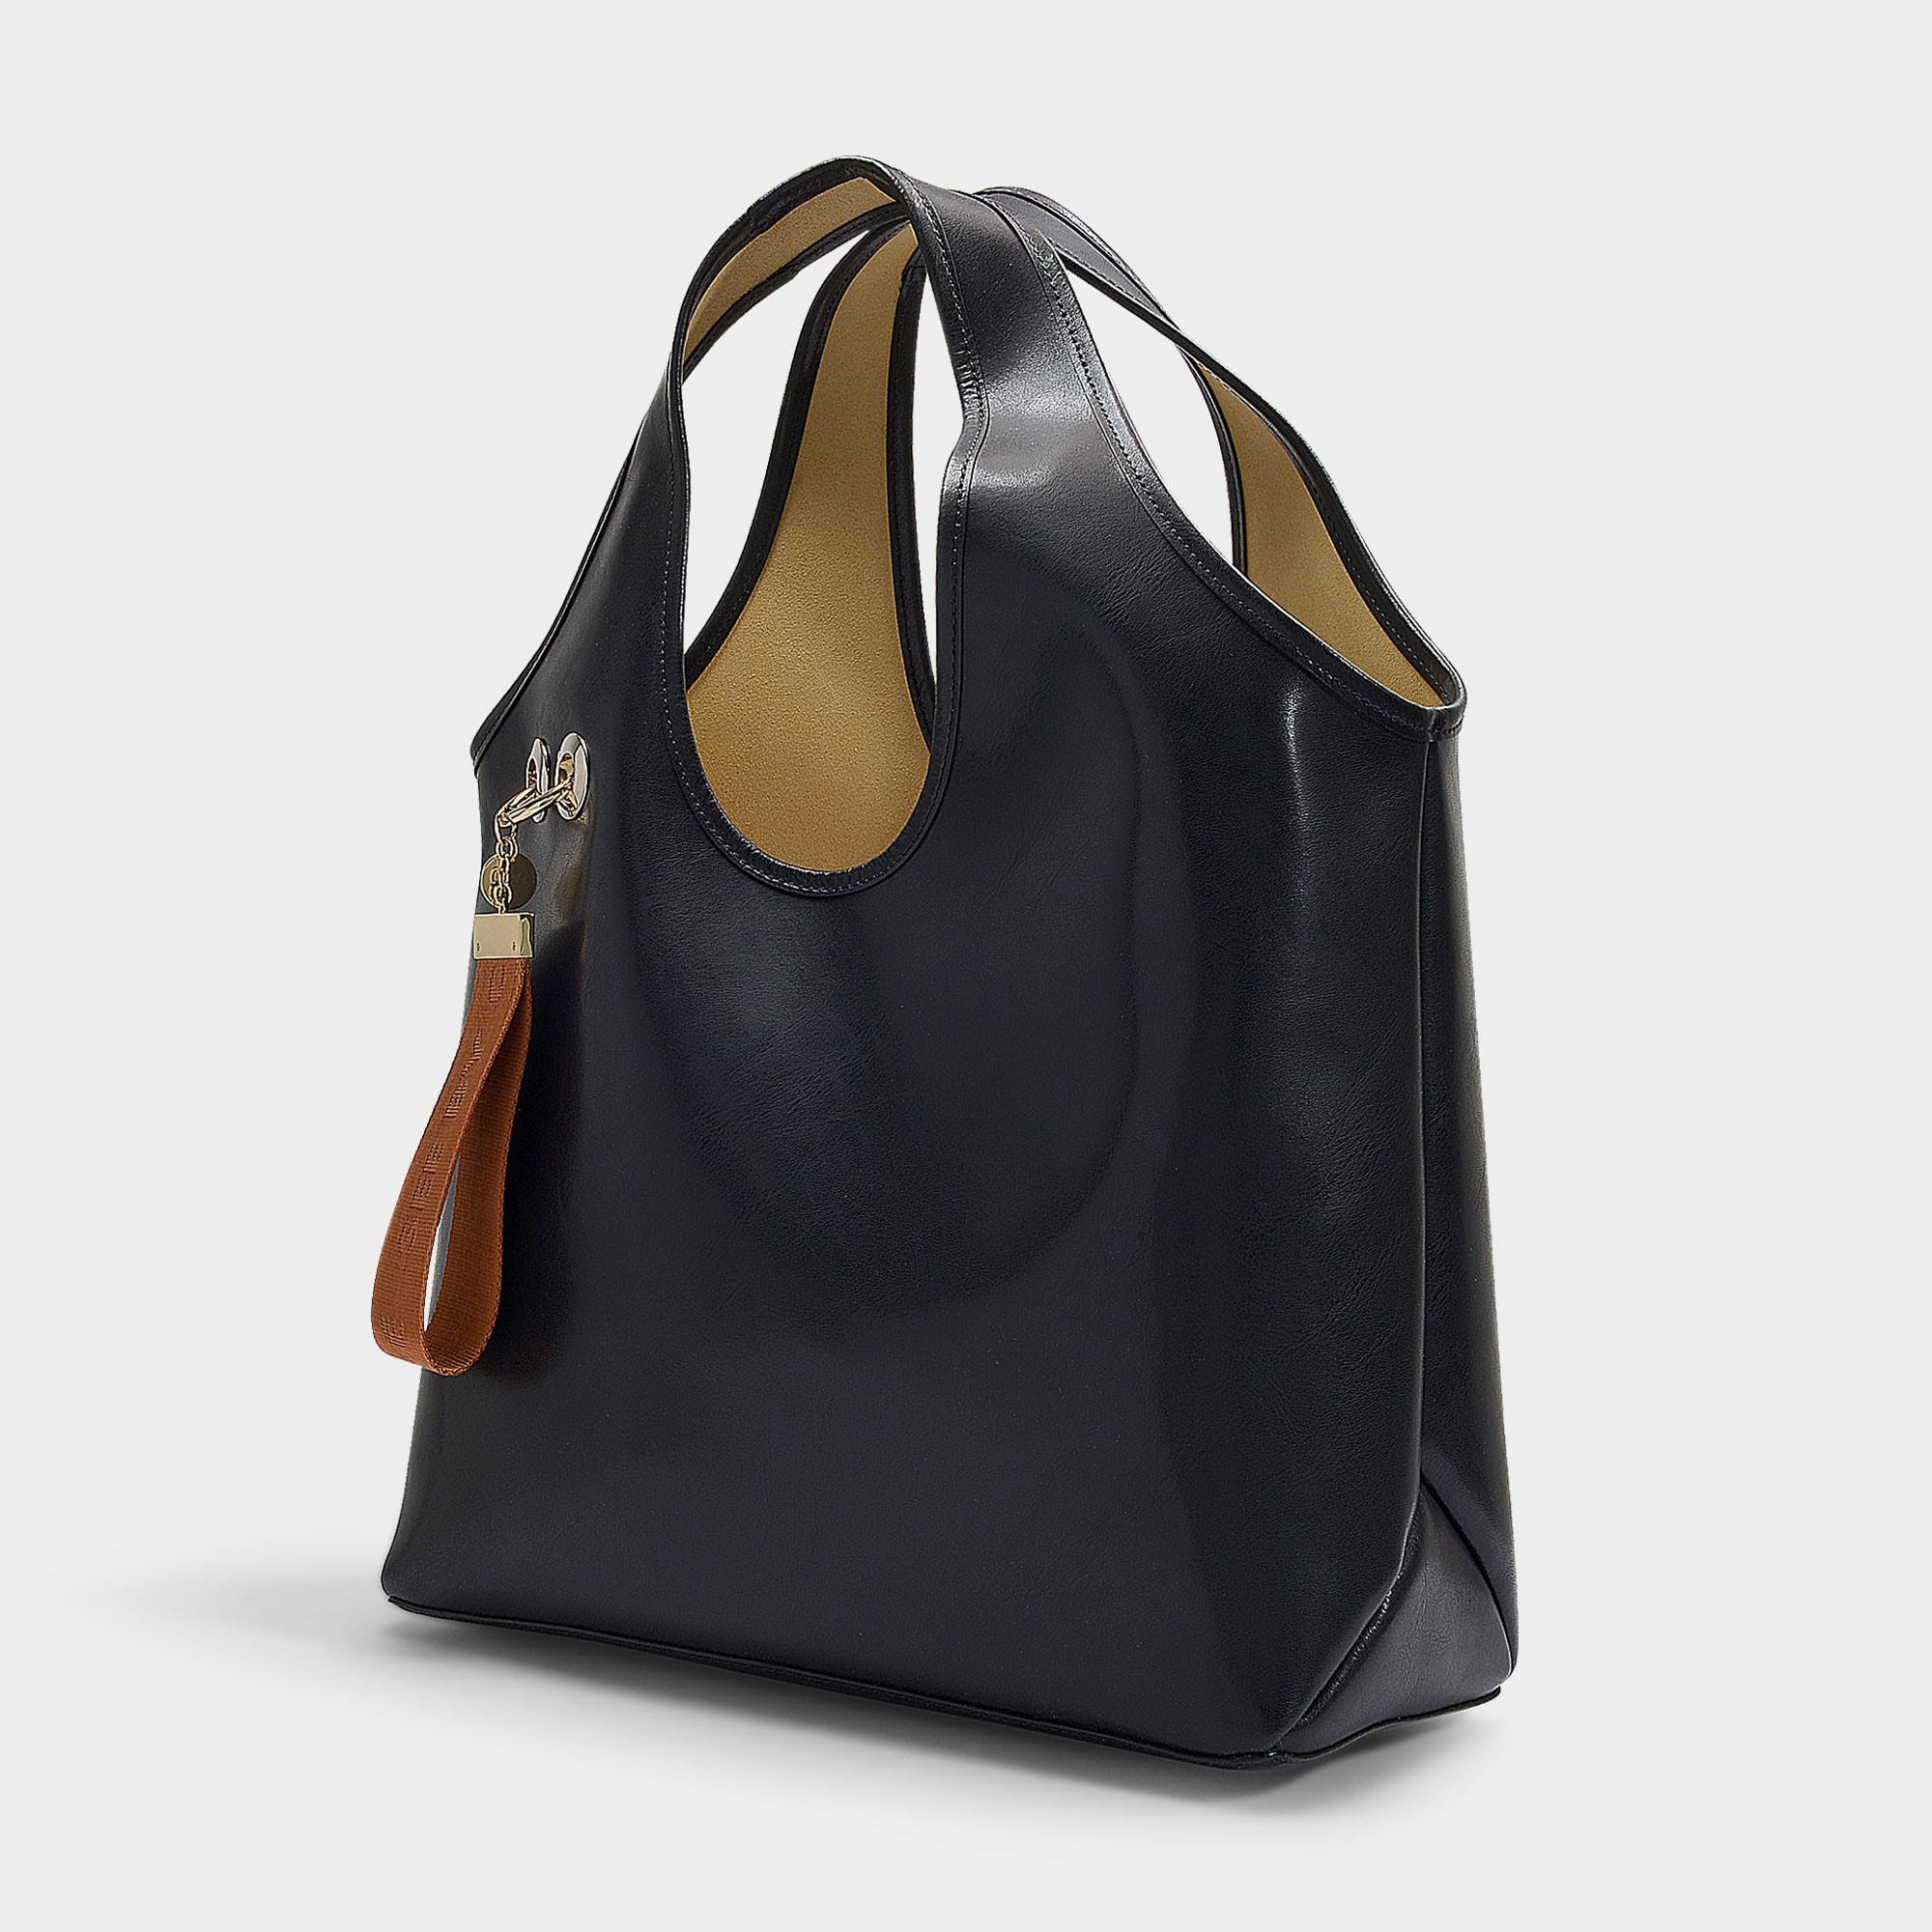 Sac See Shopping En Chloé Lyst Cuir Noir Jay Coloris Ciré By 435RjLqA